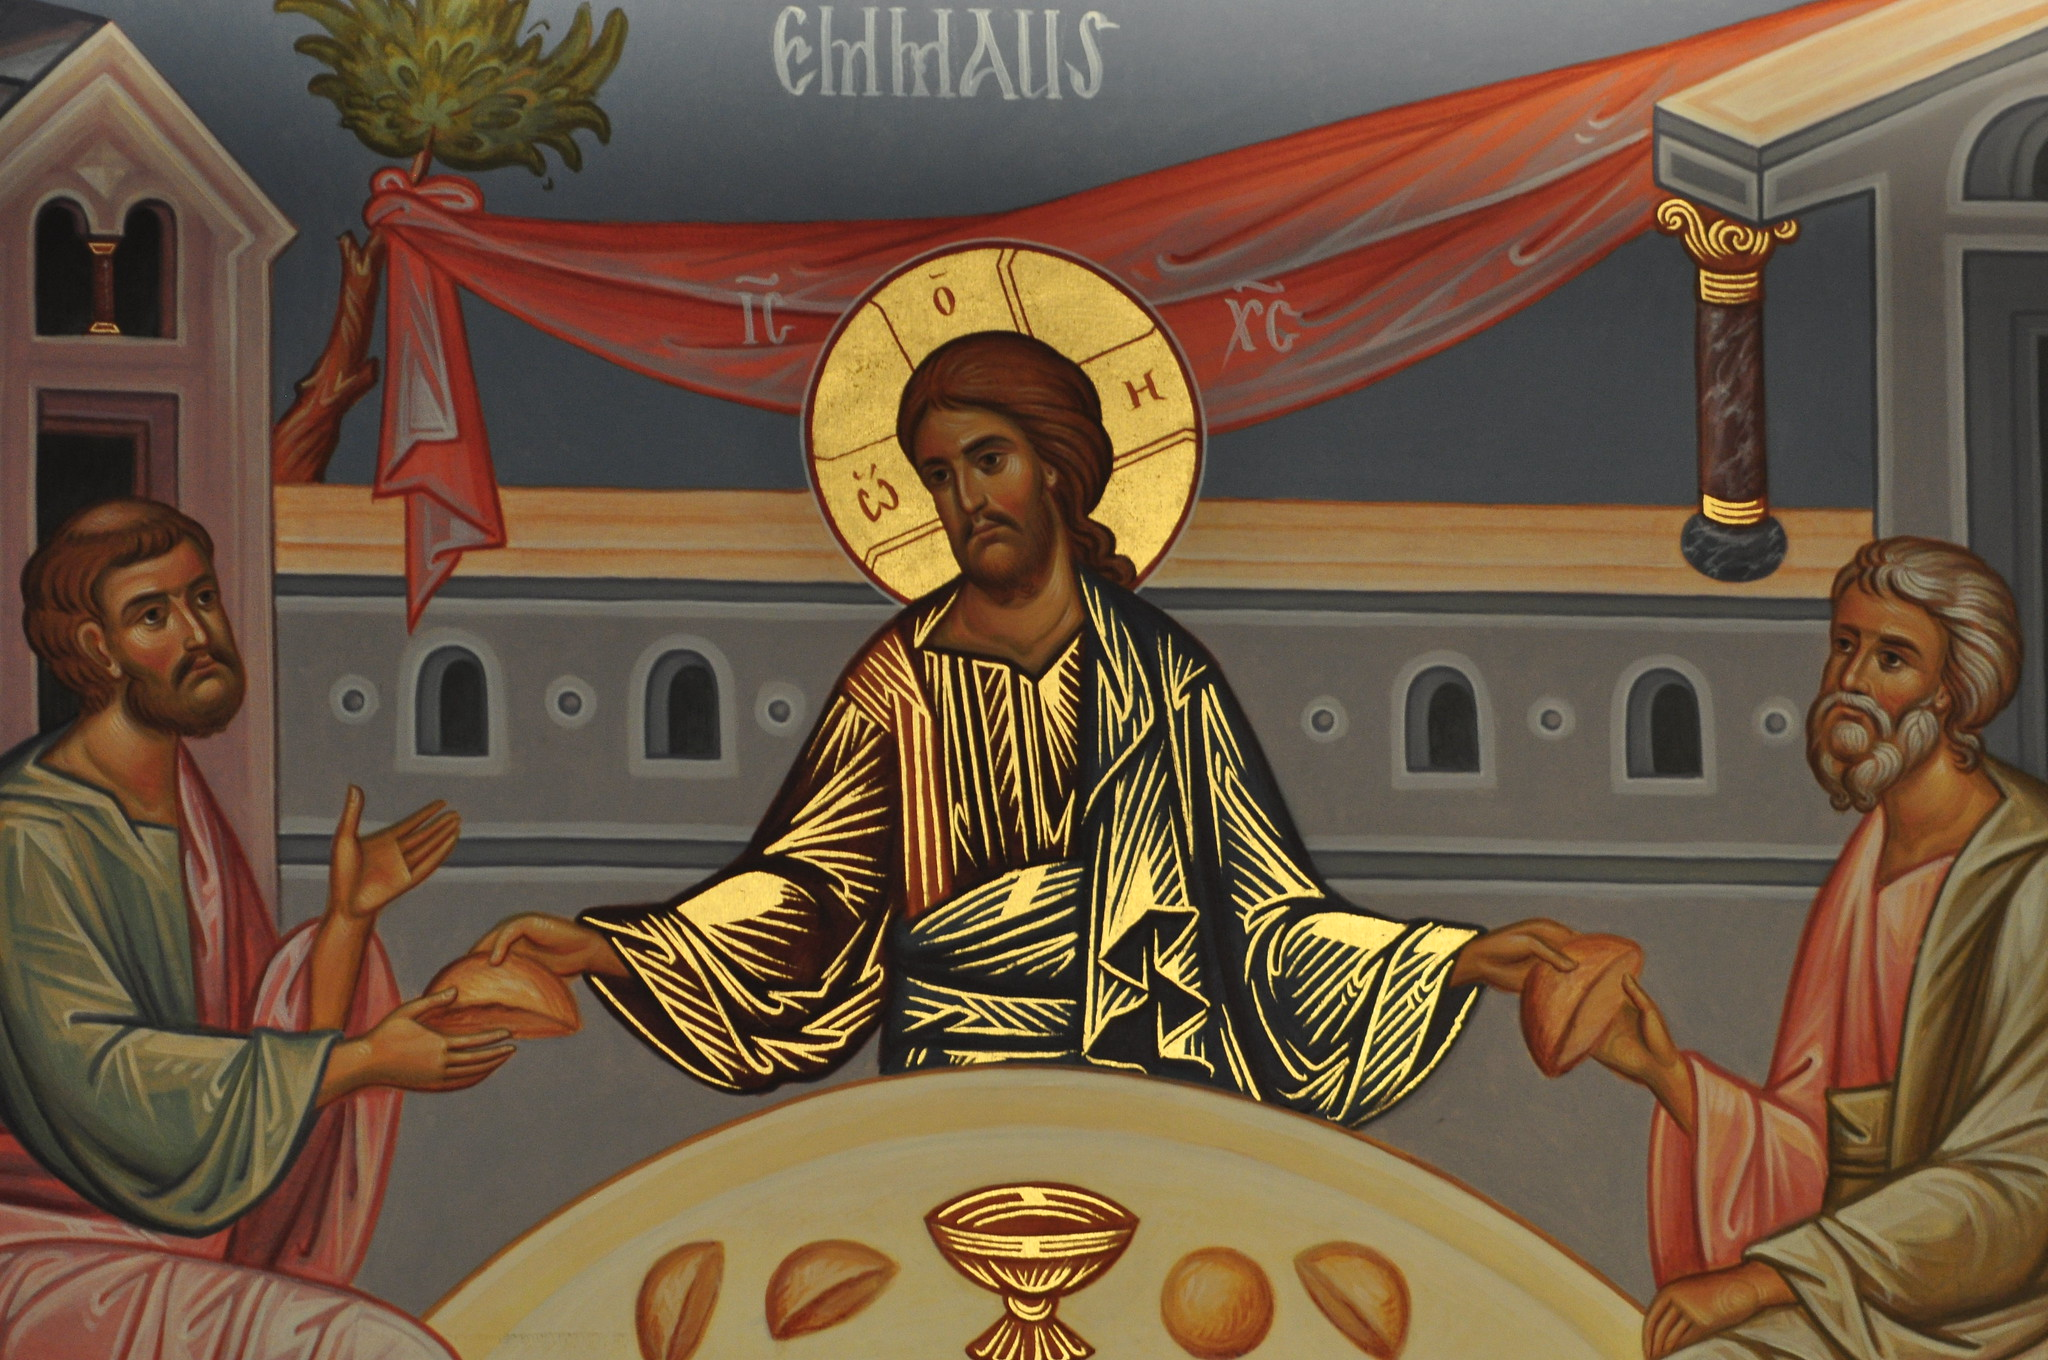 The Old Sacrament Cul-de-Sac